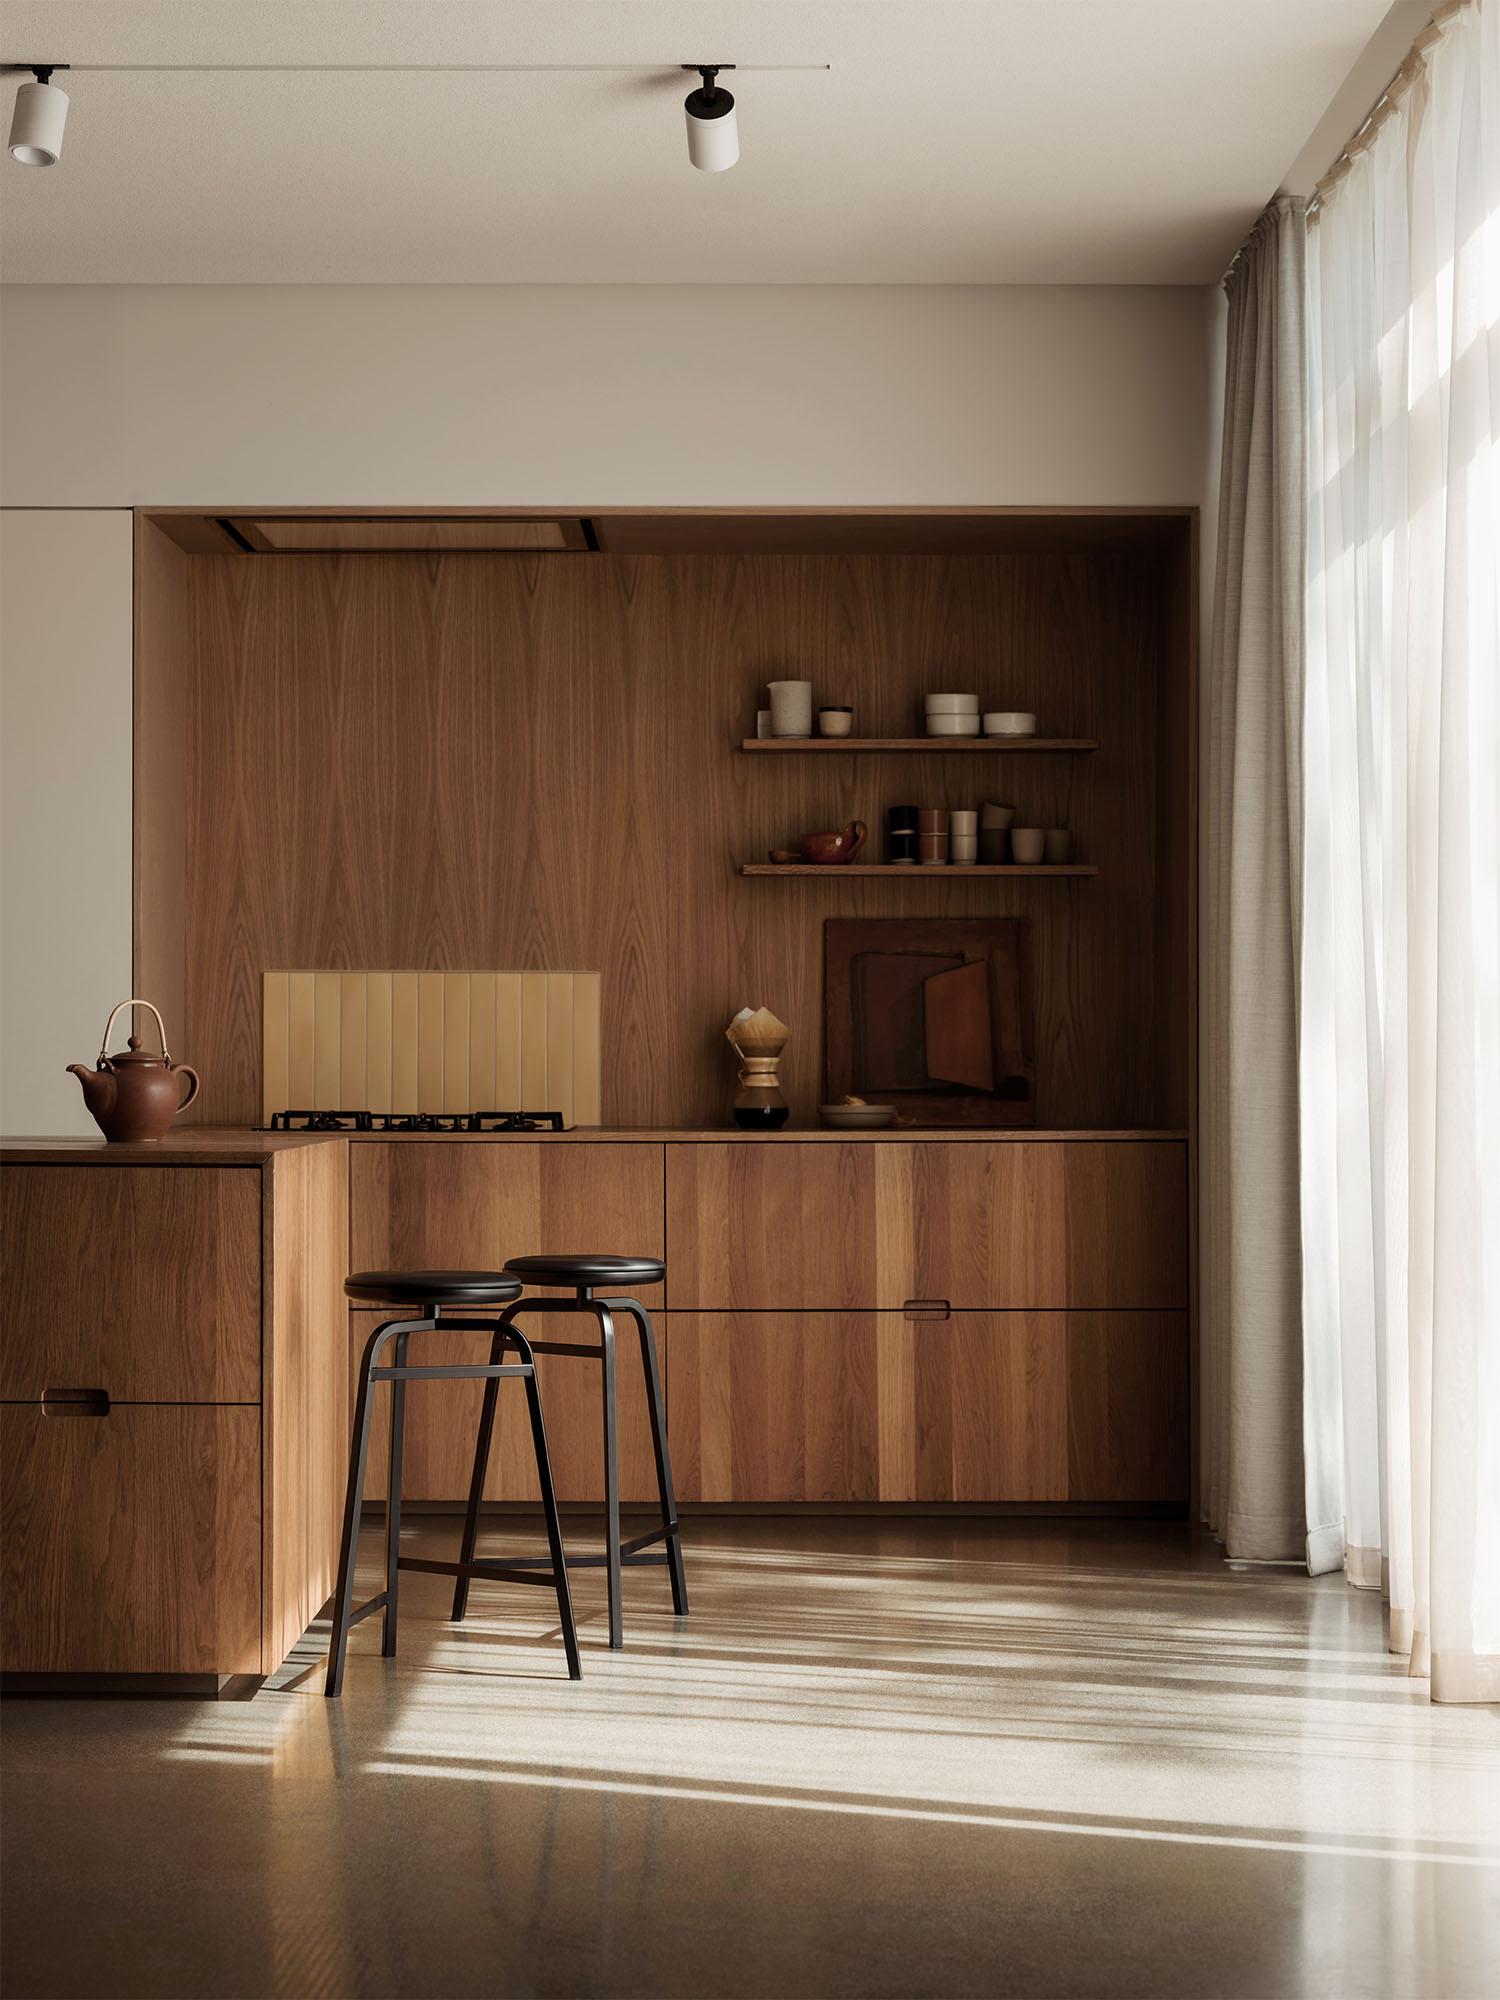 Treble_bar_stools_black_kitchen_Northern_Photo_Einar_Aslaksen_Low-res